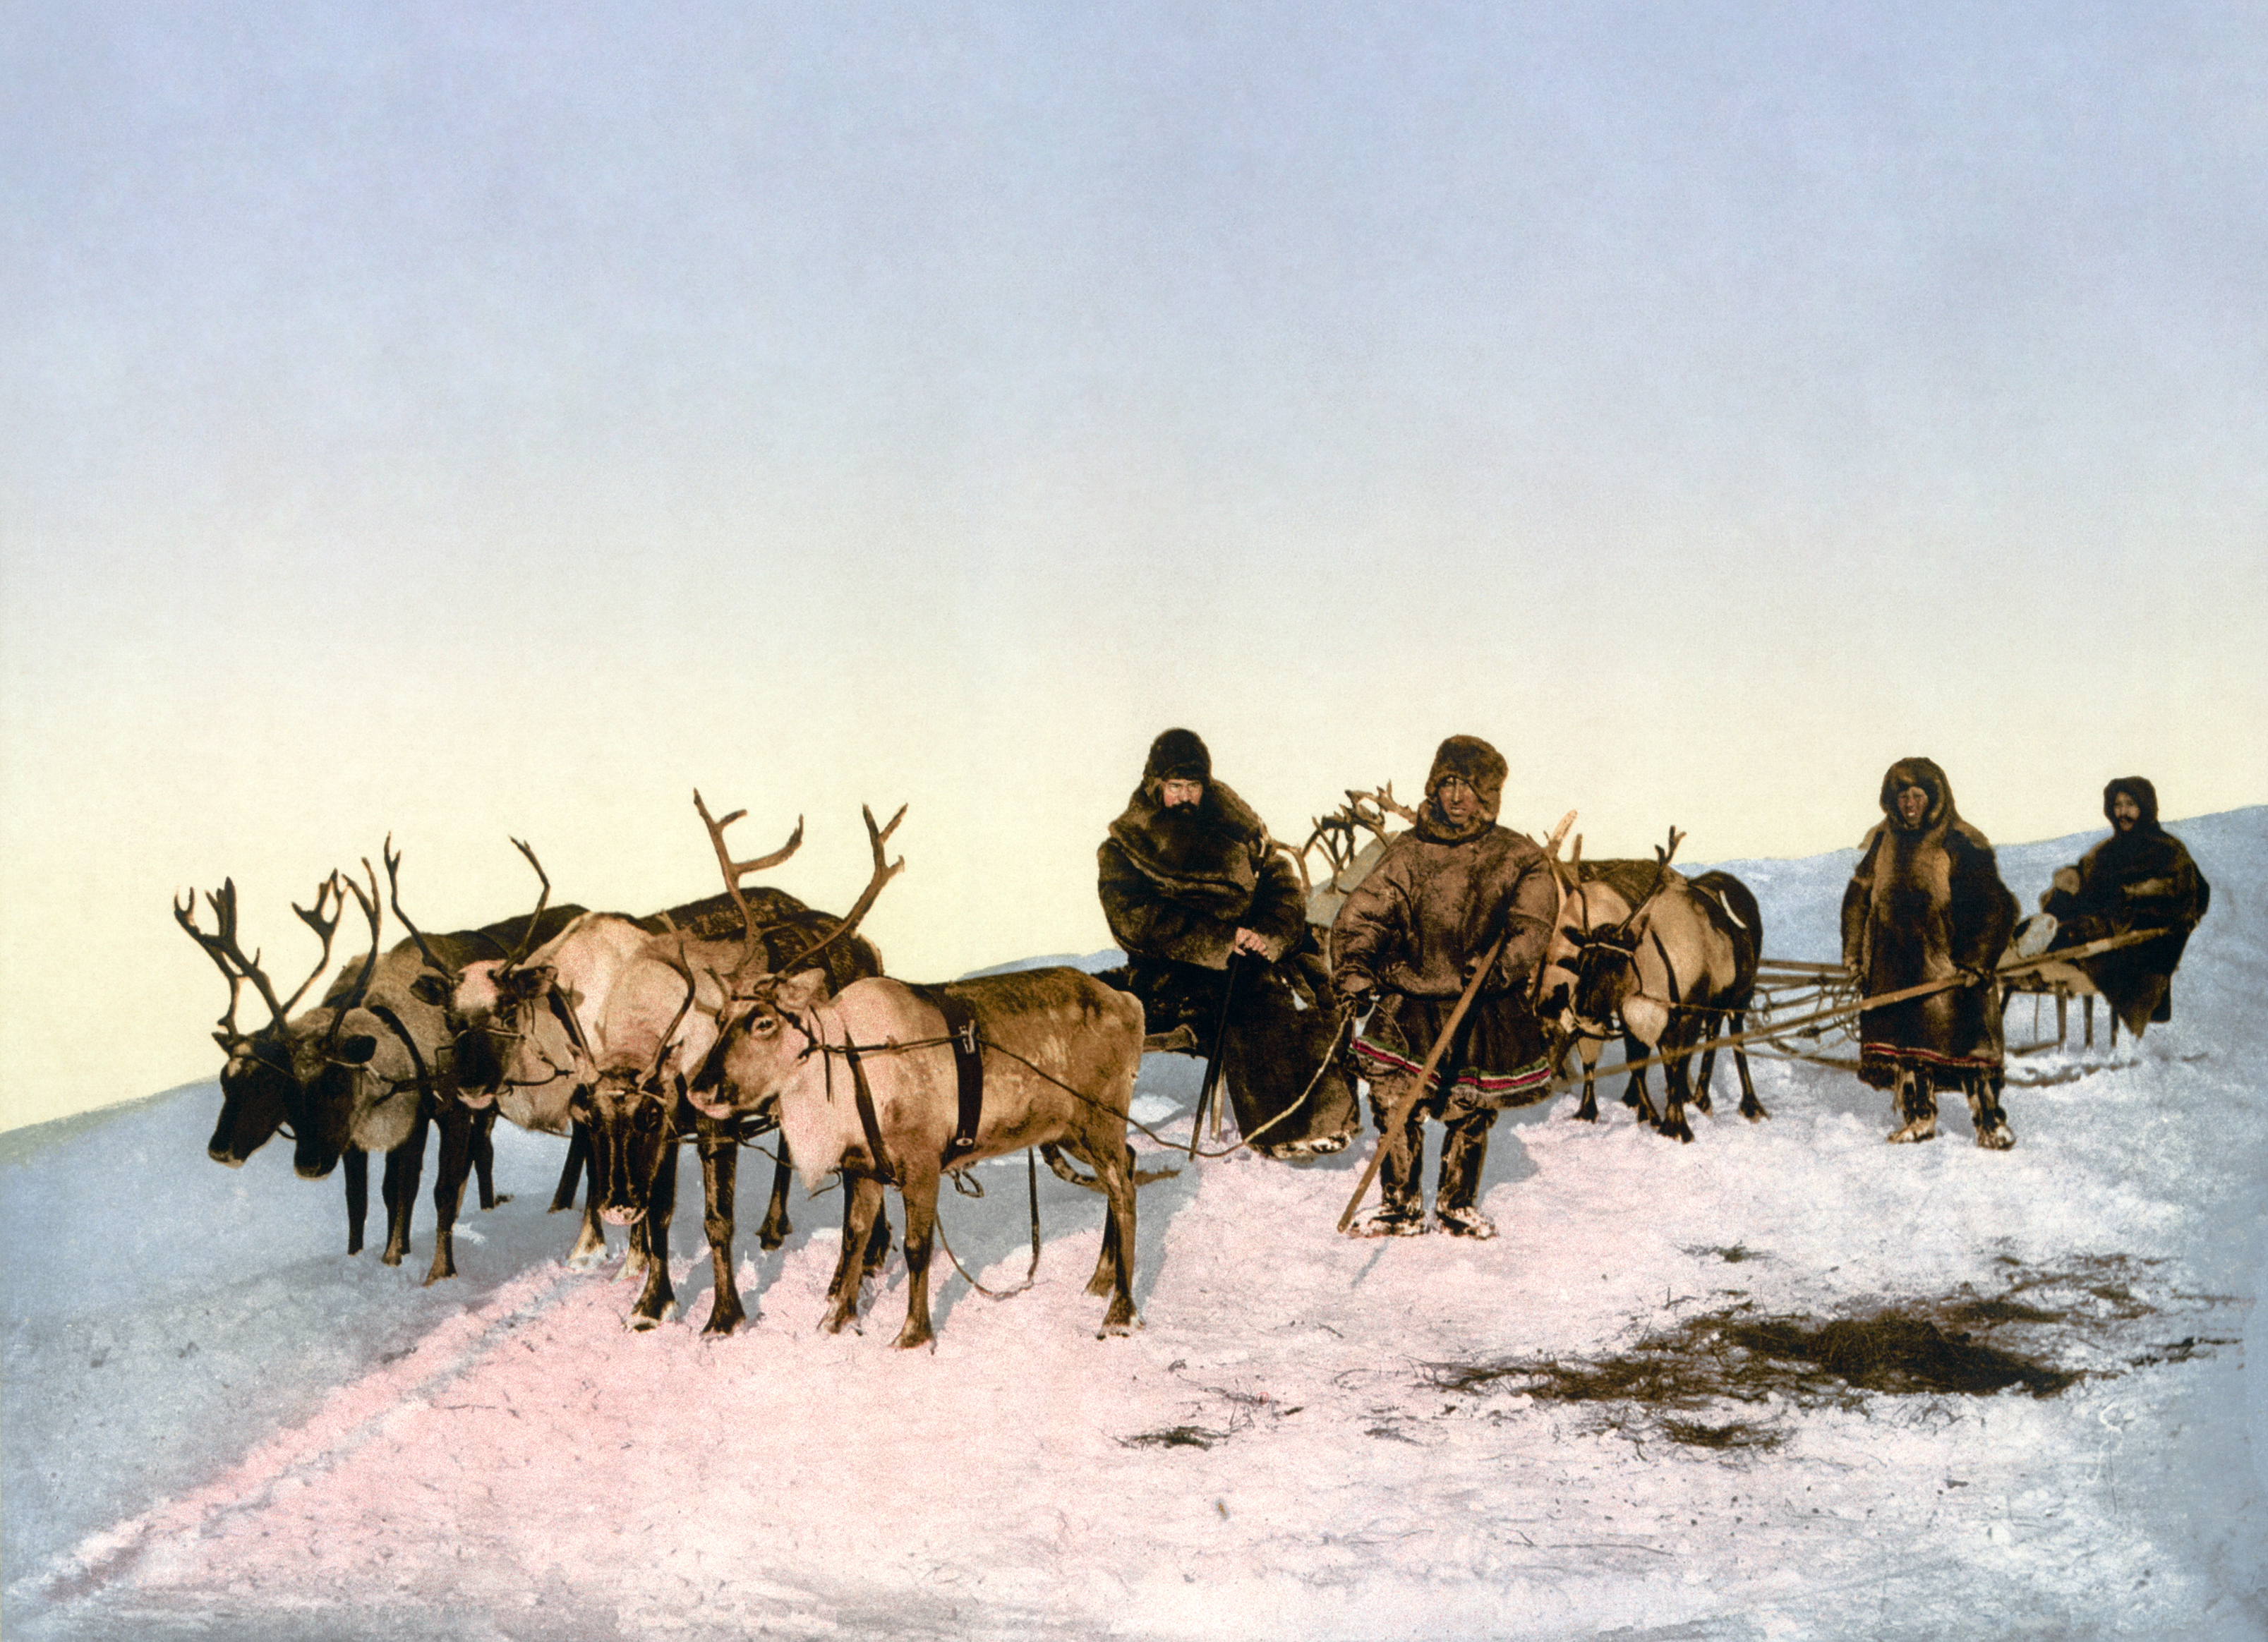 Reindeer Wikipedia